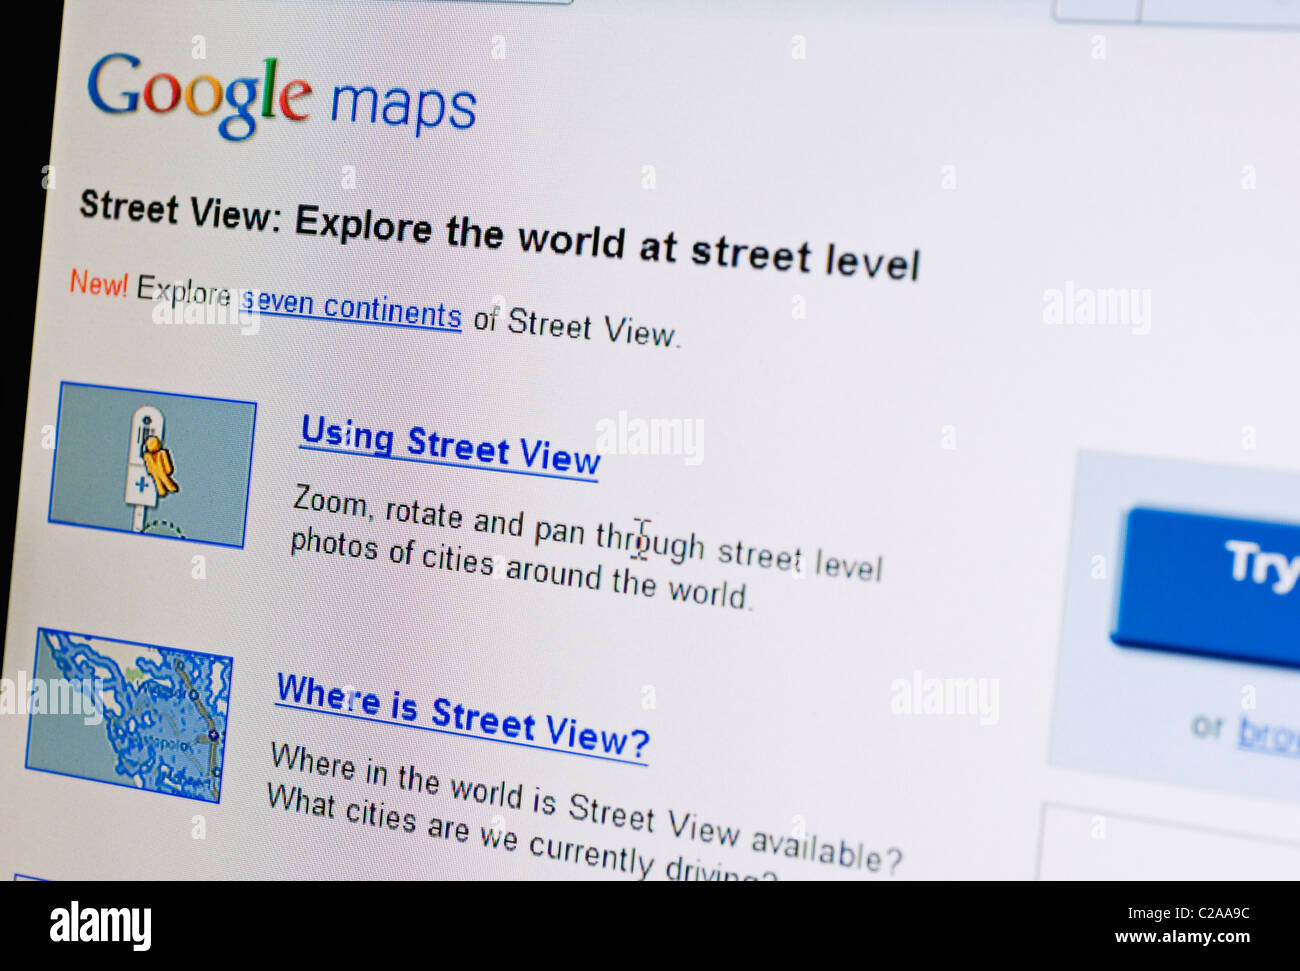 Google Maps Website Stock Photos & Google Maps Website Stock